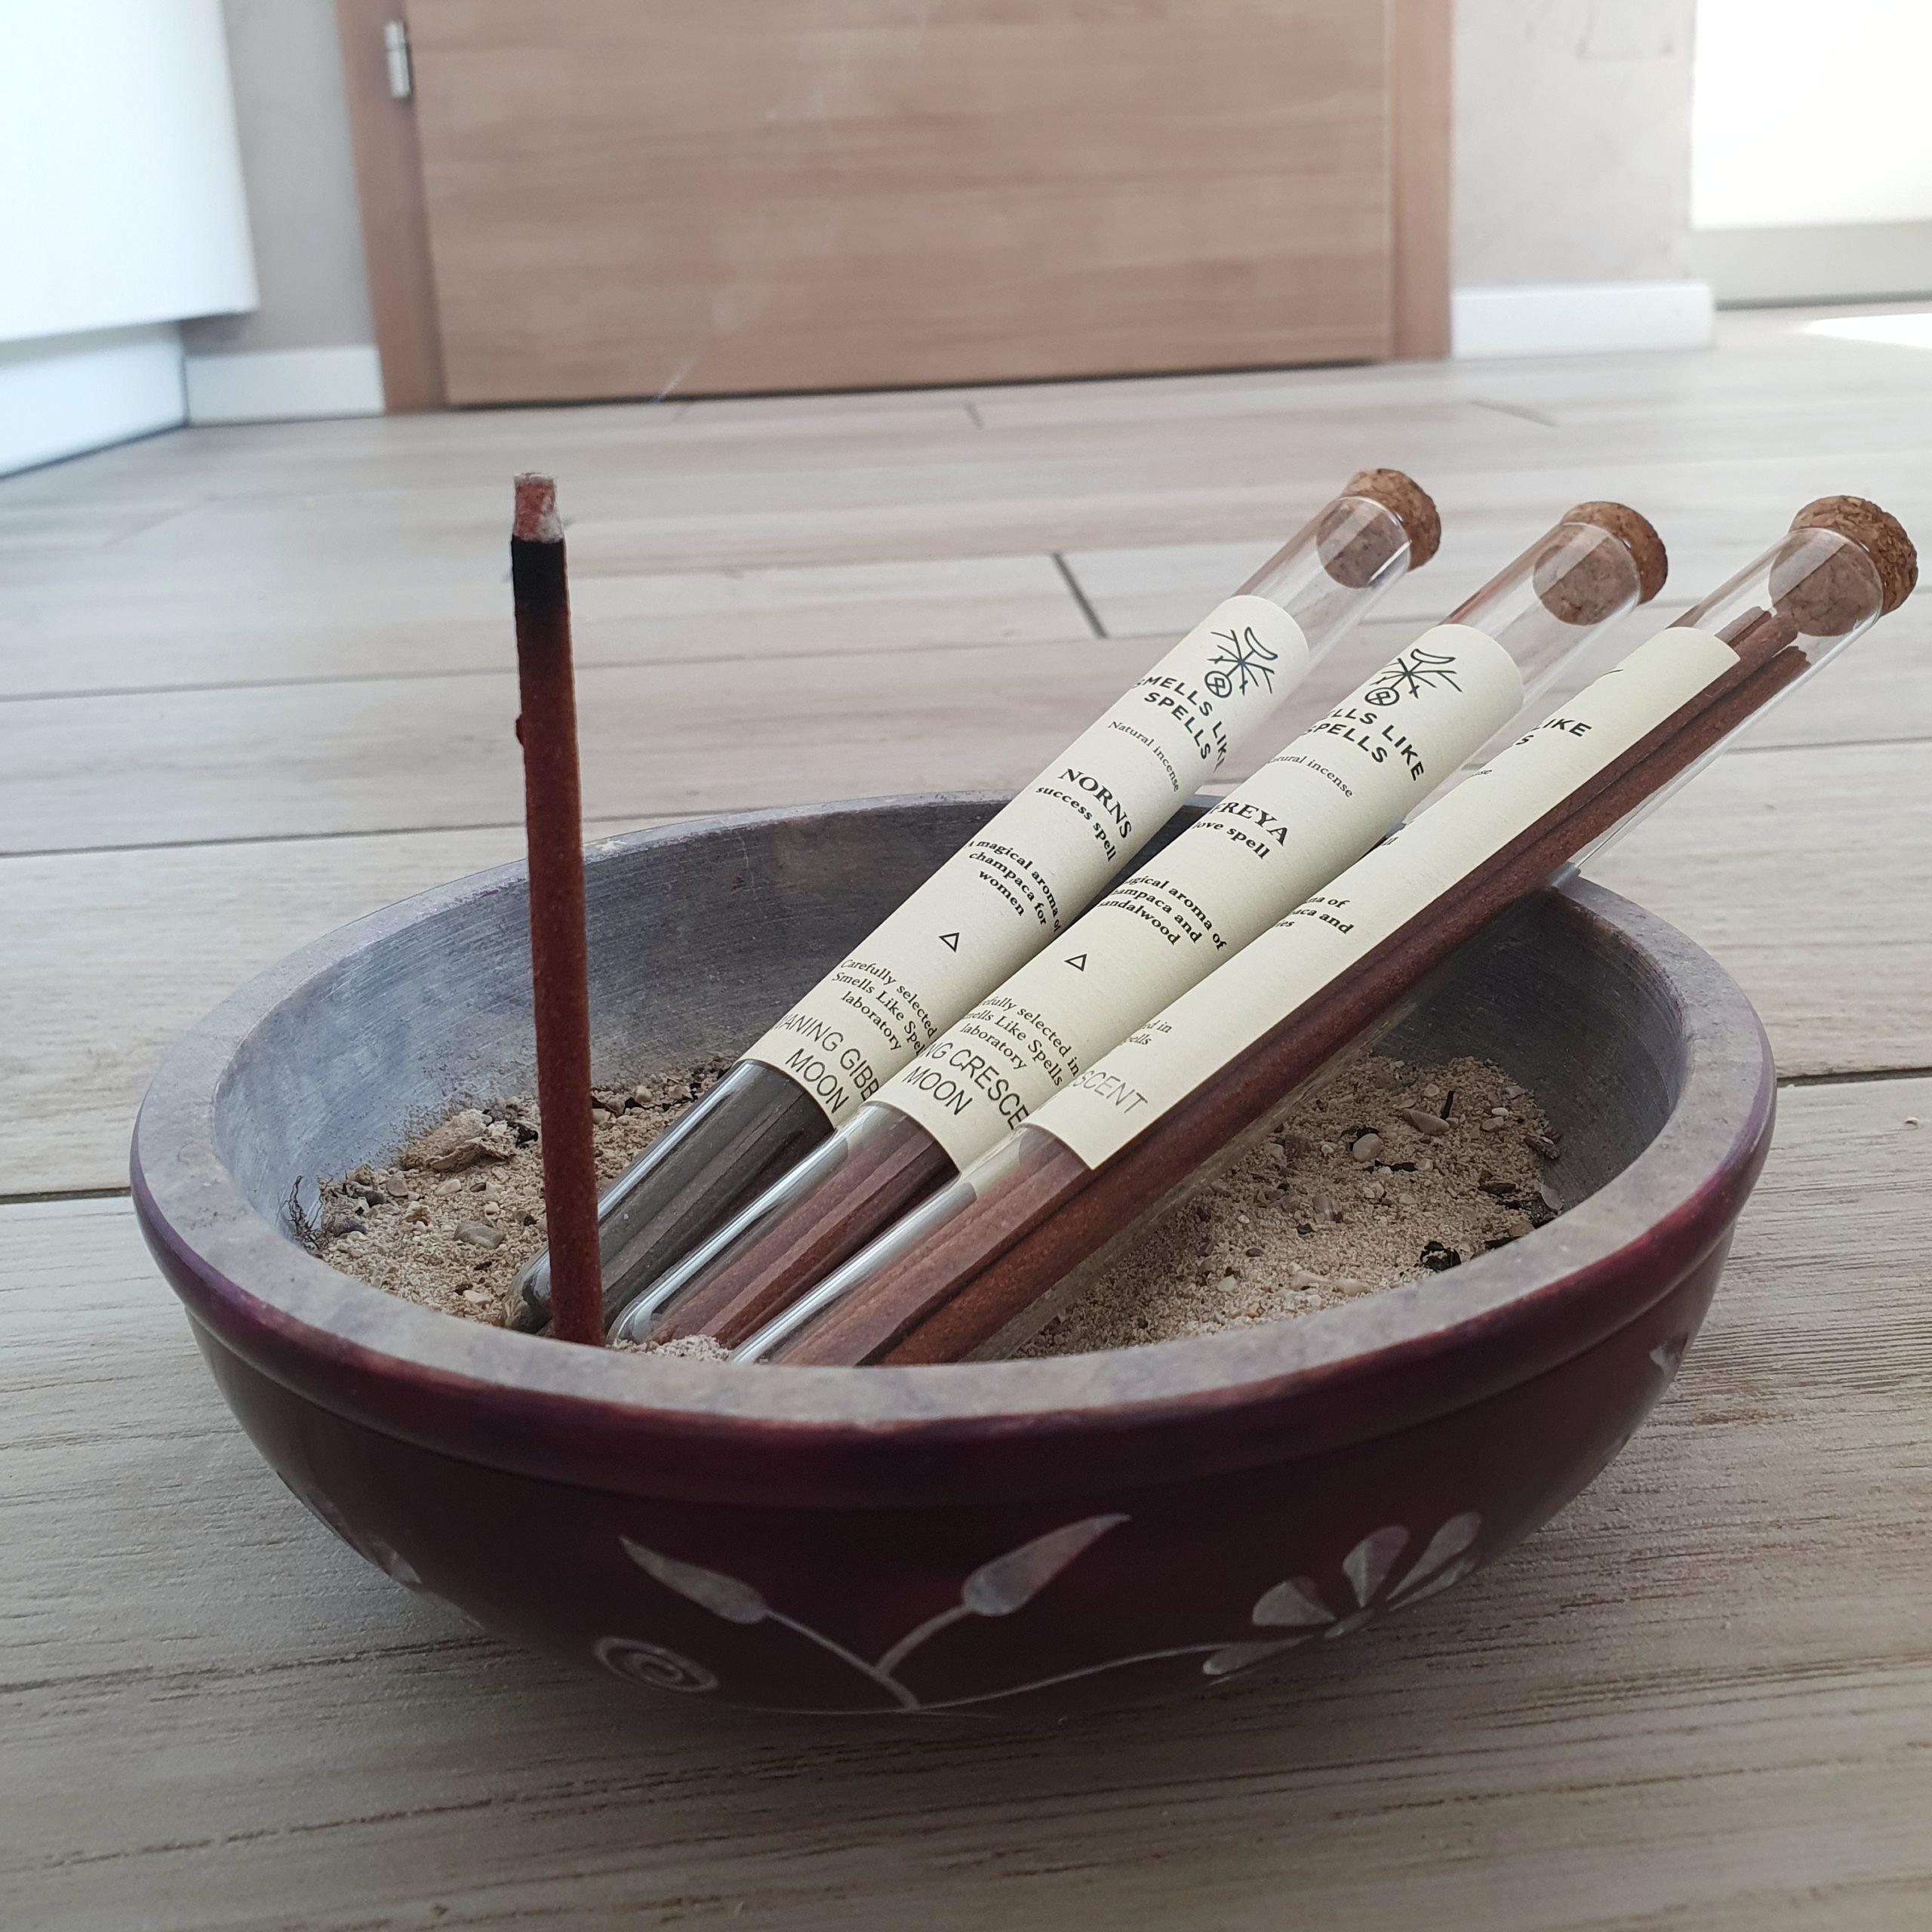 Aromatherapie im Alltag